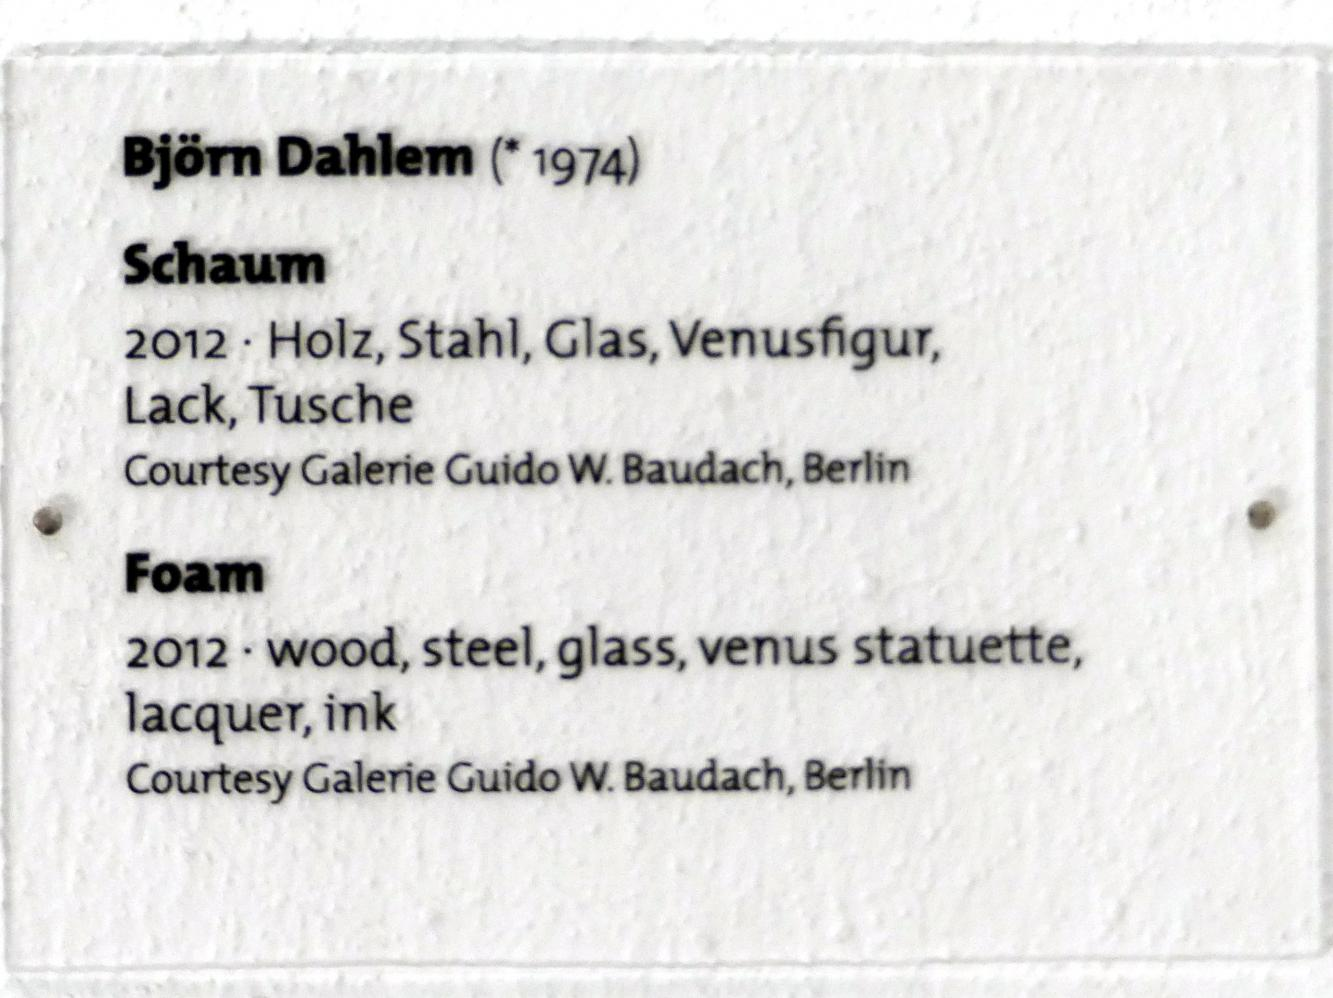 Björn Dahlem: Schaum, 2012